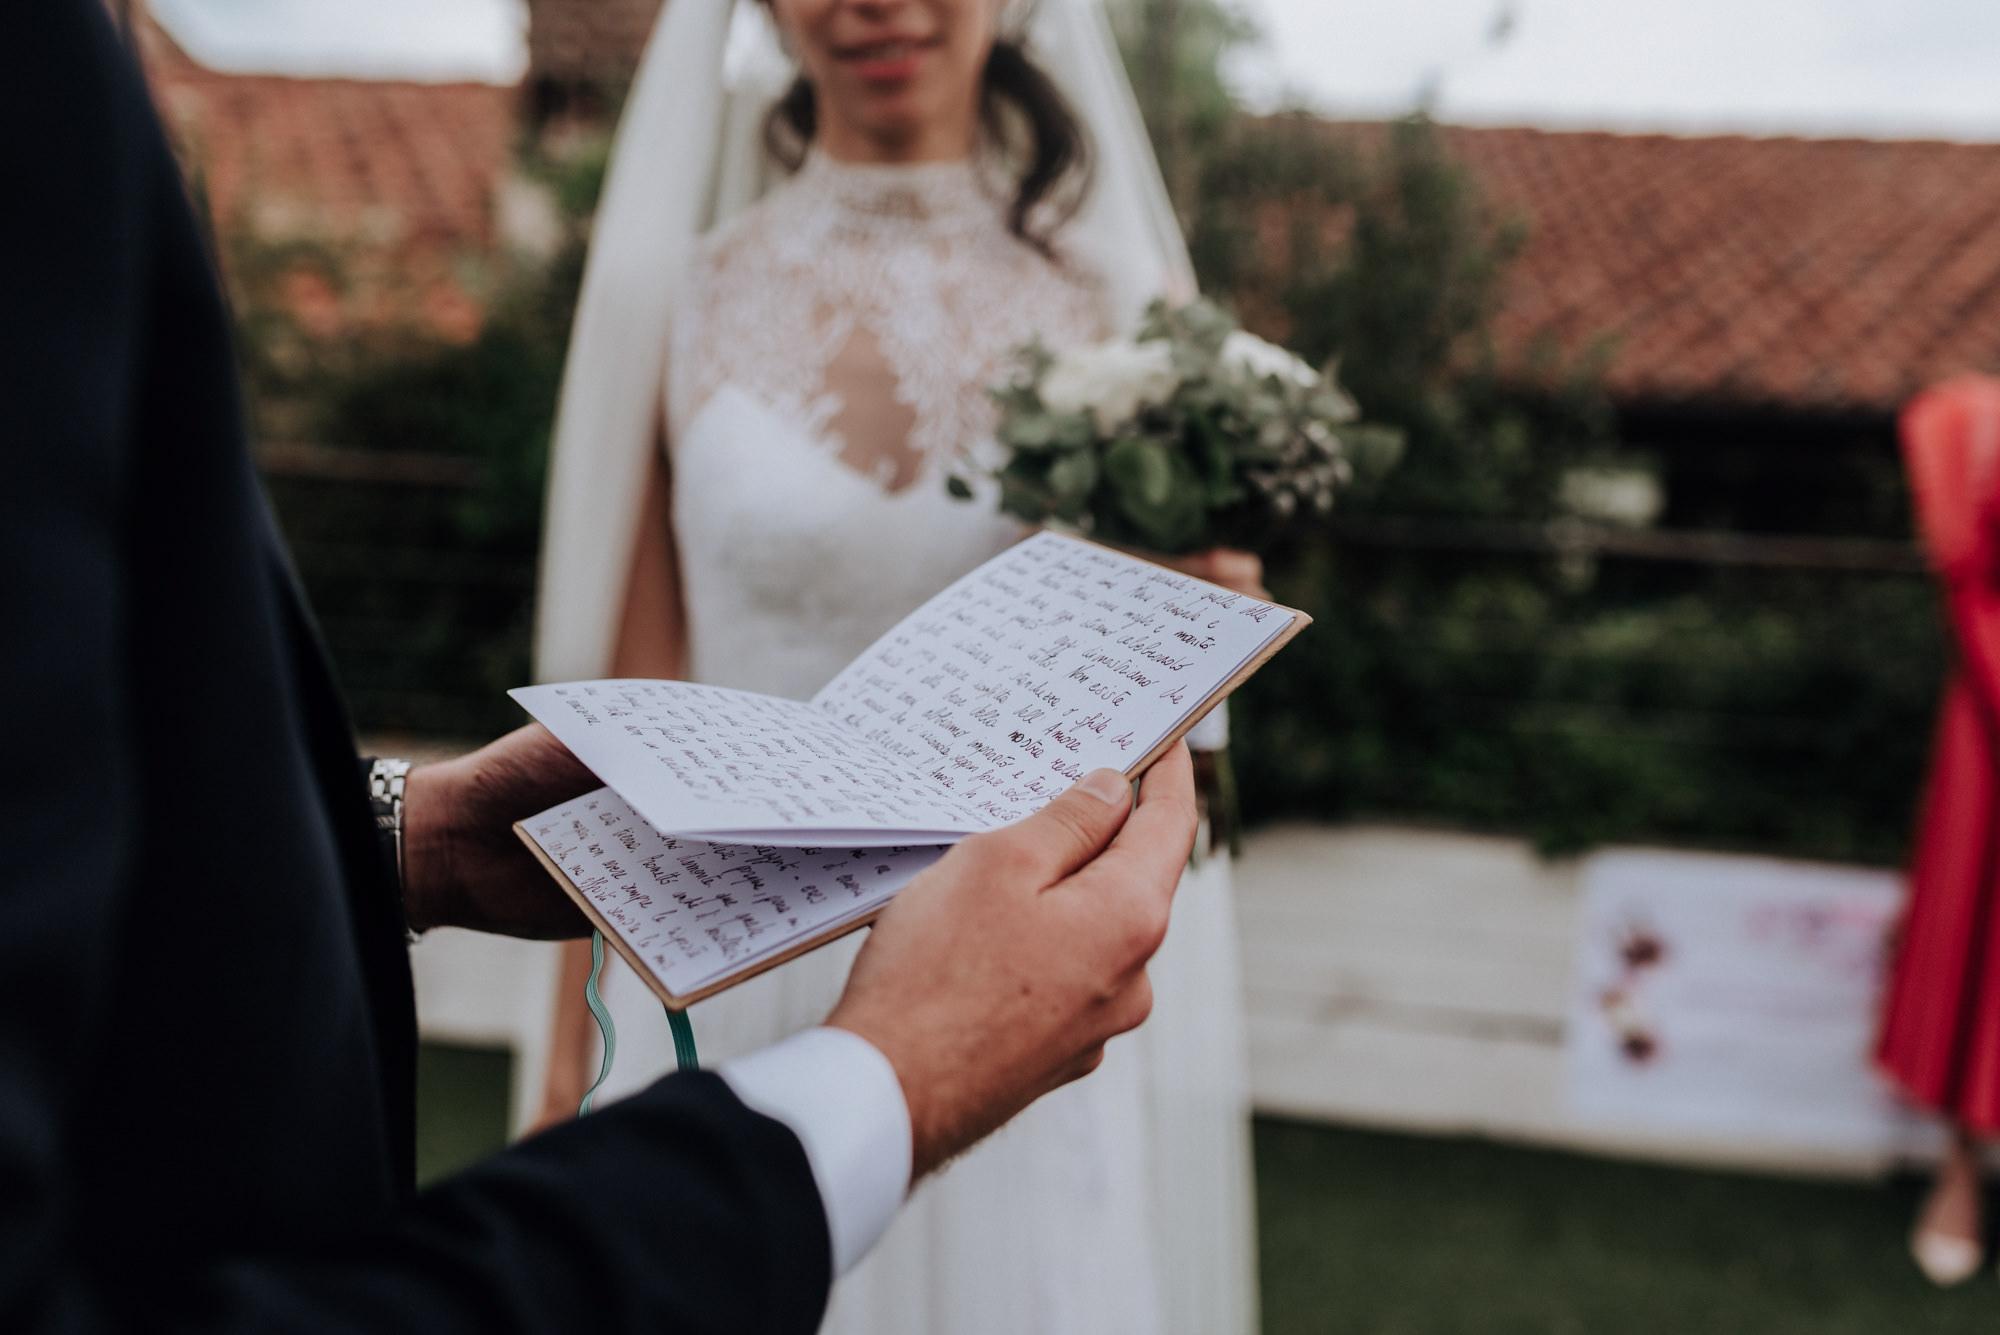 FOTO+PHOTO+BODA+WEDDING+ITALIA+ITALY+MAURICIO+GARAY+MAURICIOGARAY+WEDDINPHOTOGRAPHER+FOTOGRAFODEBODA-1483.jpg